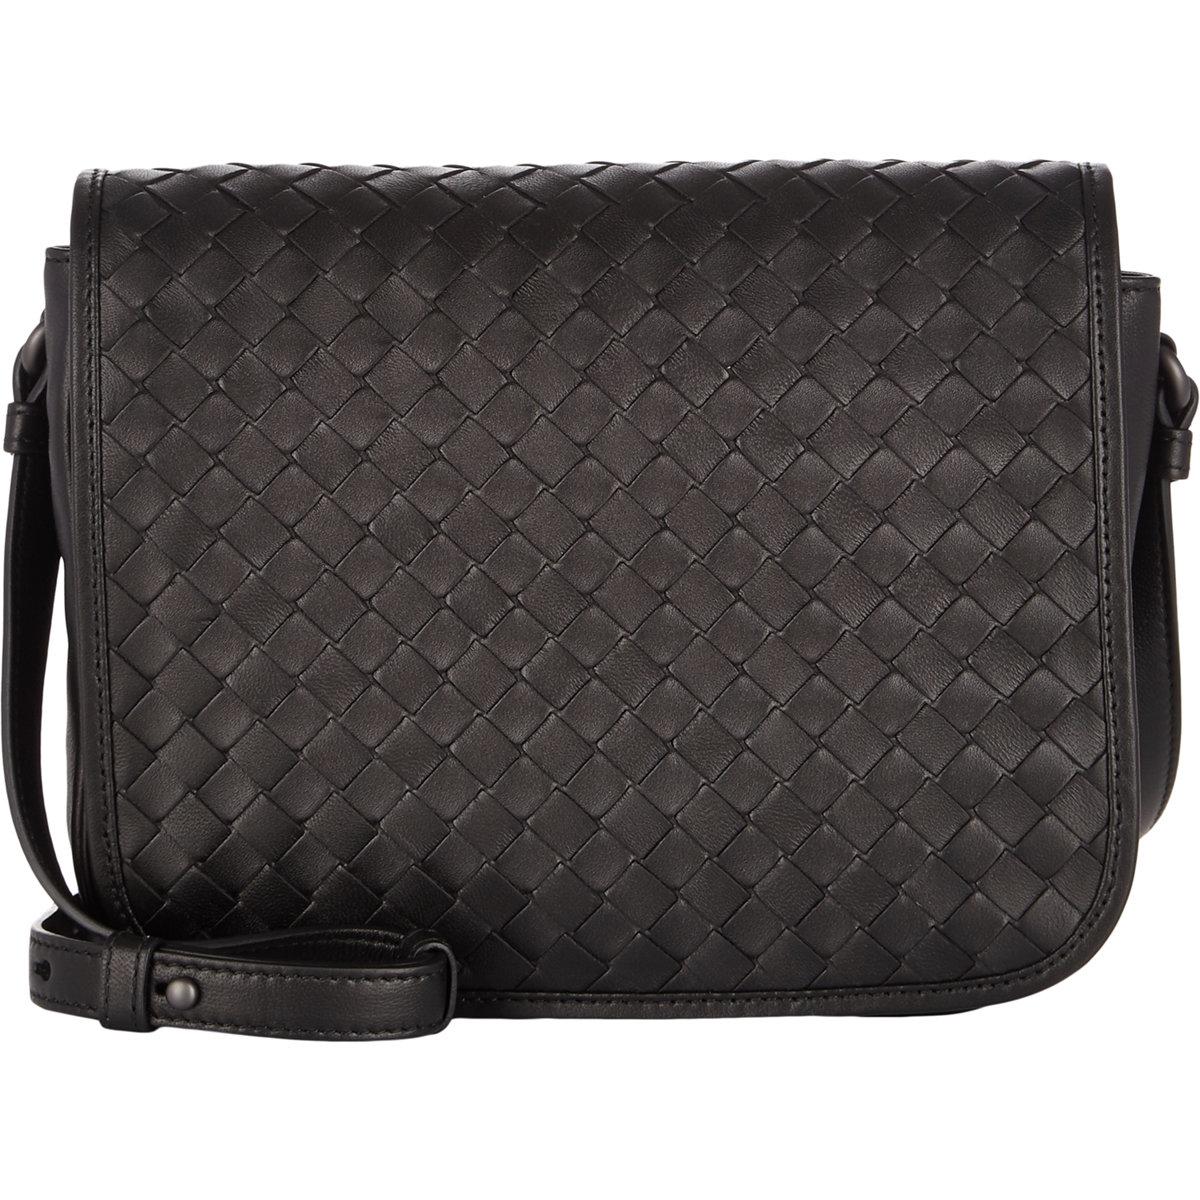 https   www.lyst.com bags bottega-veneta-womens-intrecciato-small ... 81e4a45ccc674